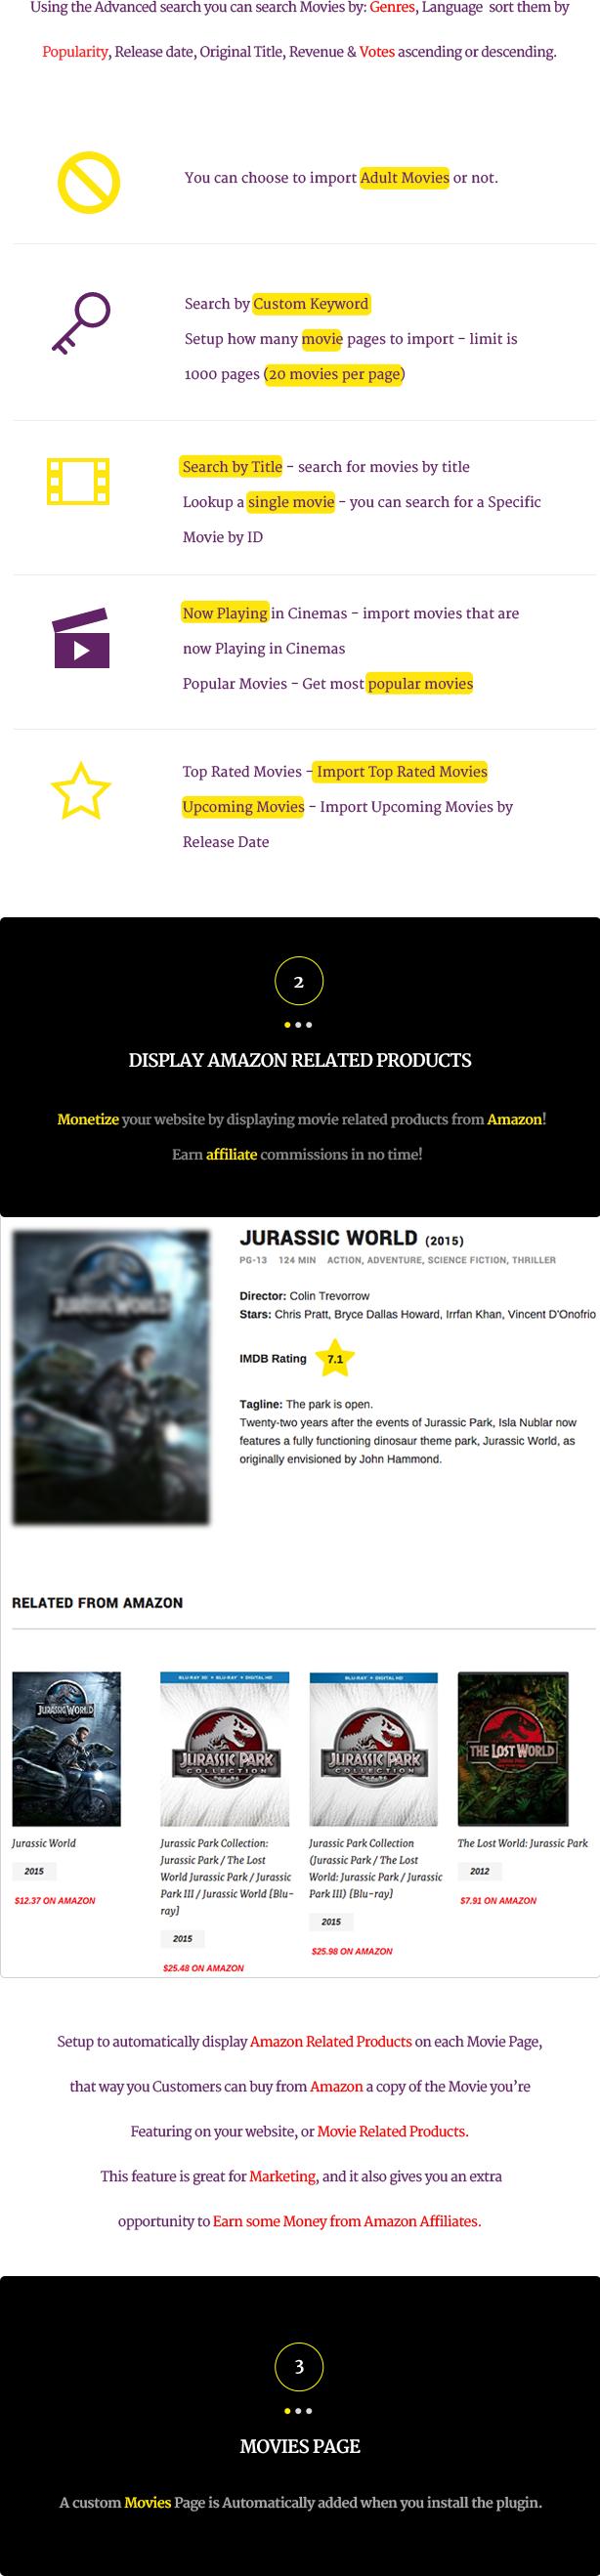 Wordpress Movies Bulk Importer - 6 Wordpress Movies Bulk Importer - displayamazon - Wordpress Movies Bulk Importer